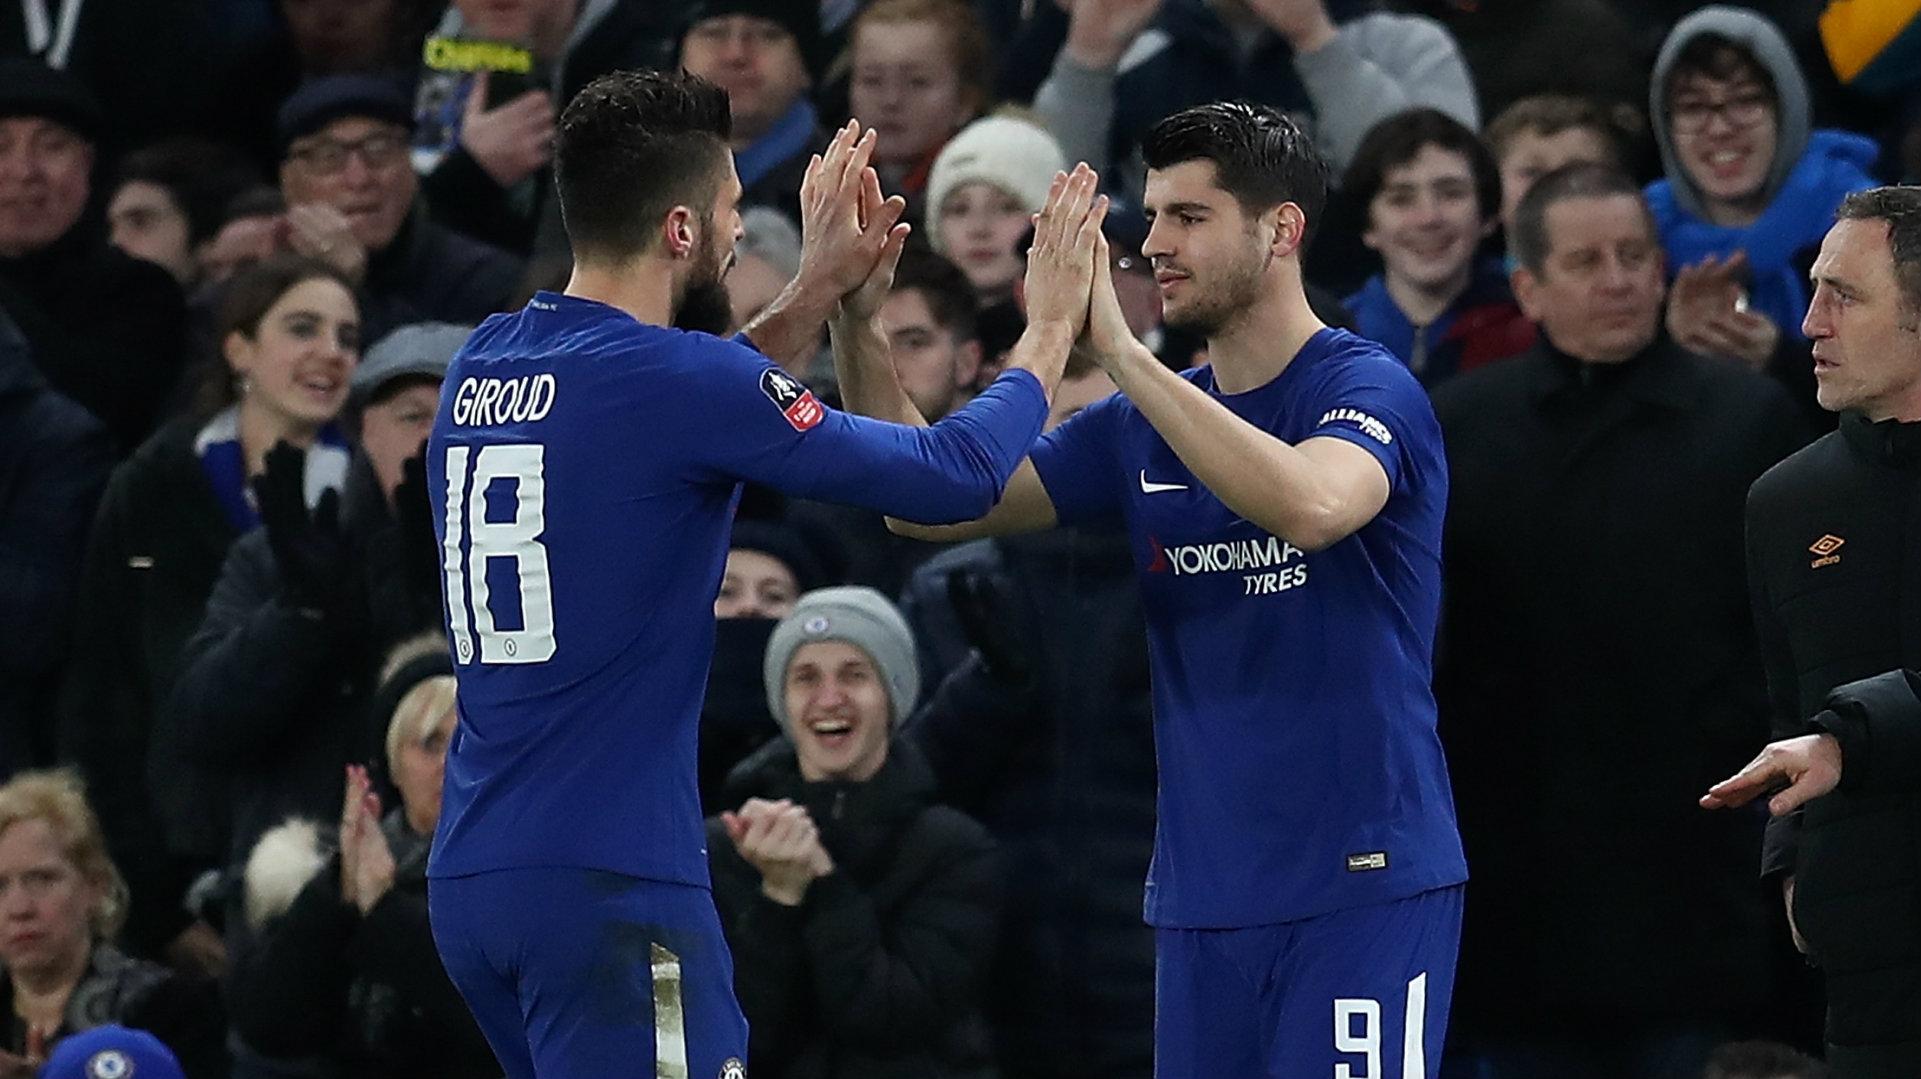 Olivier Giroud, Alvaro Morata, Chelsea, 17/18